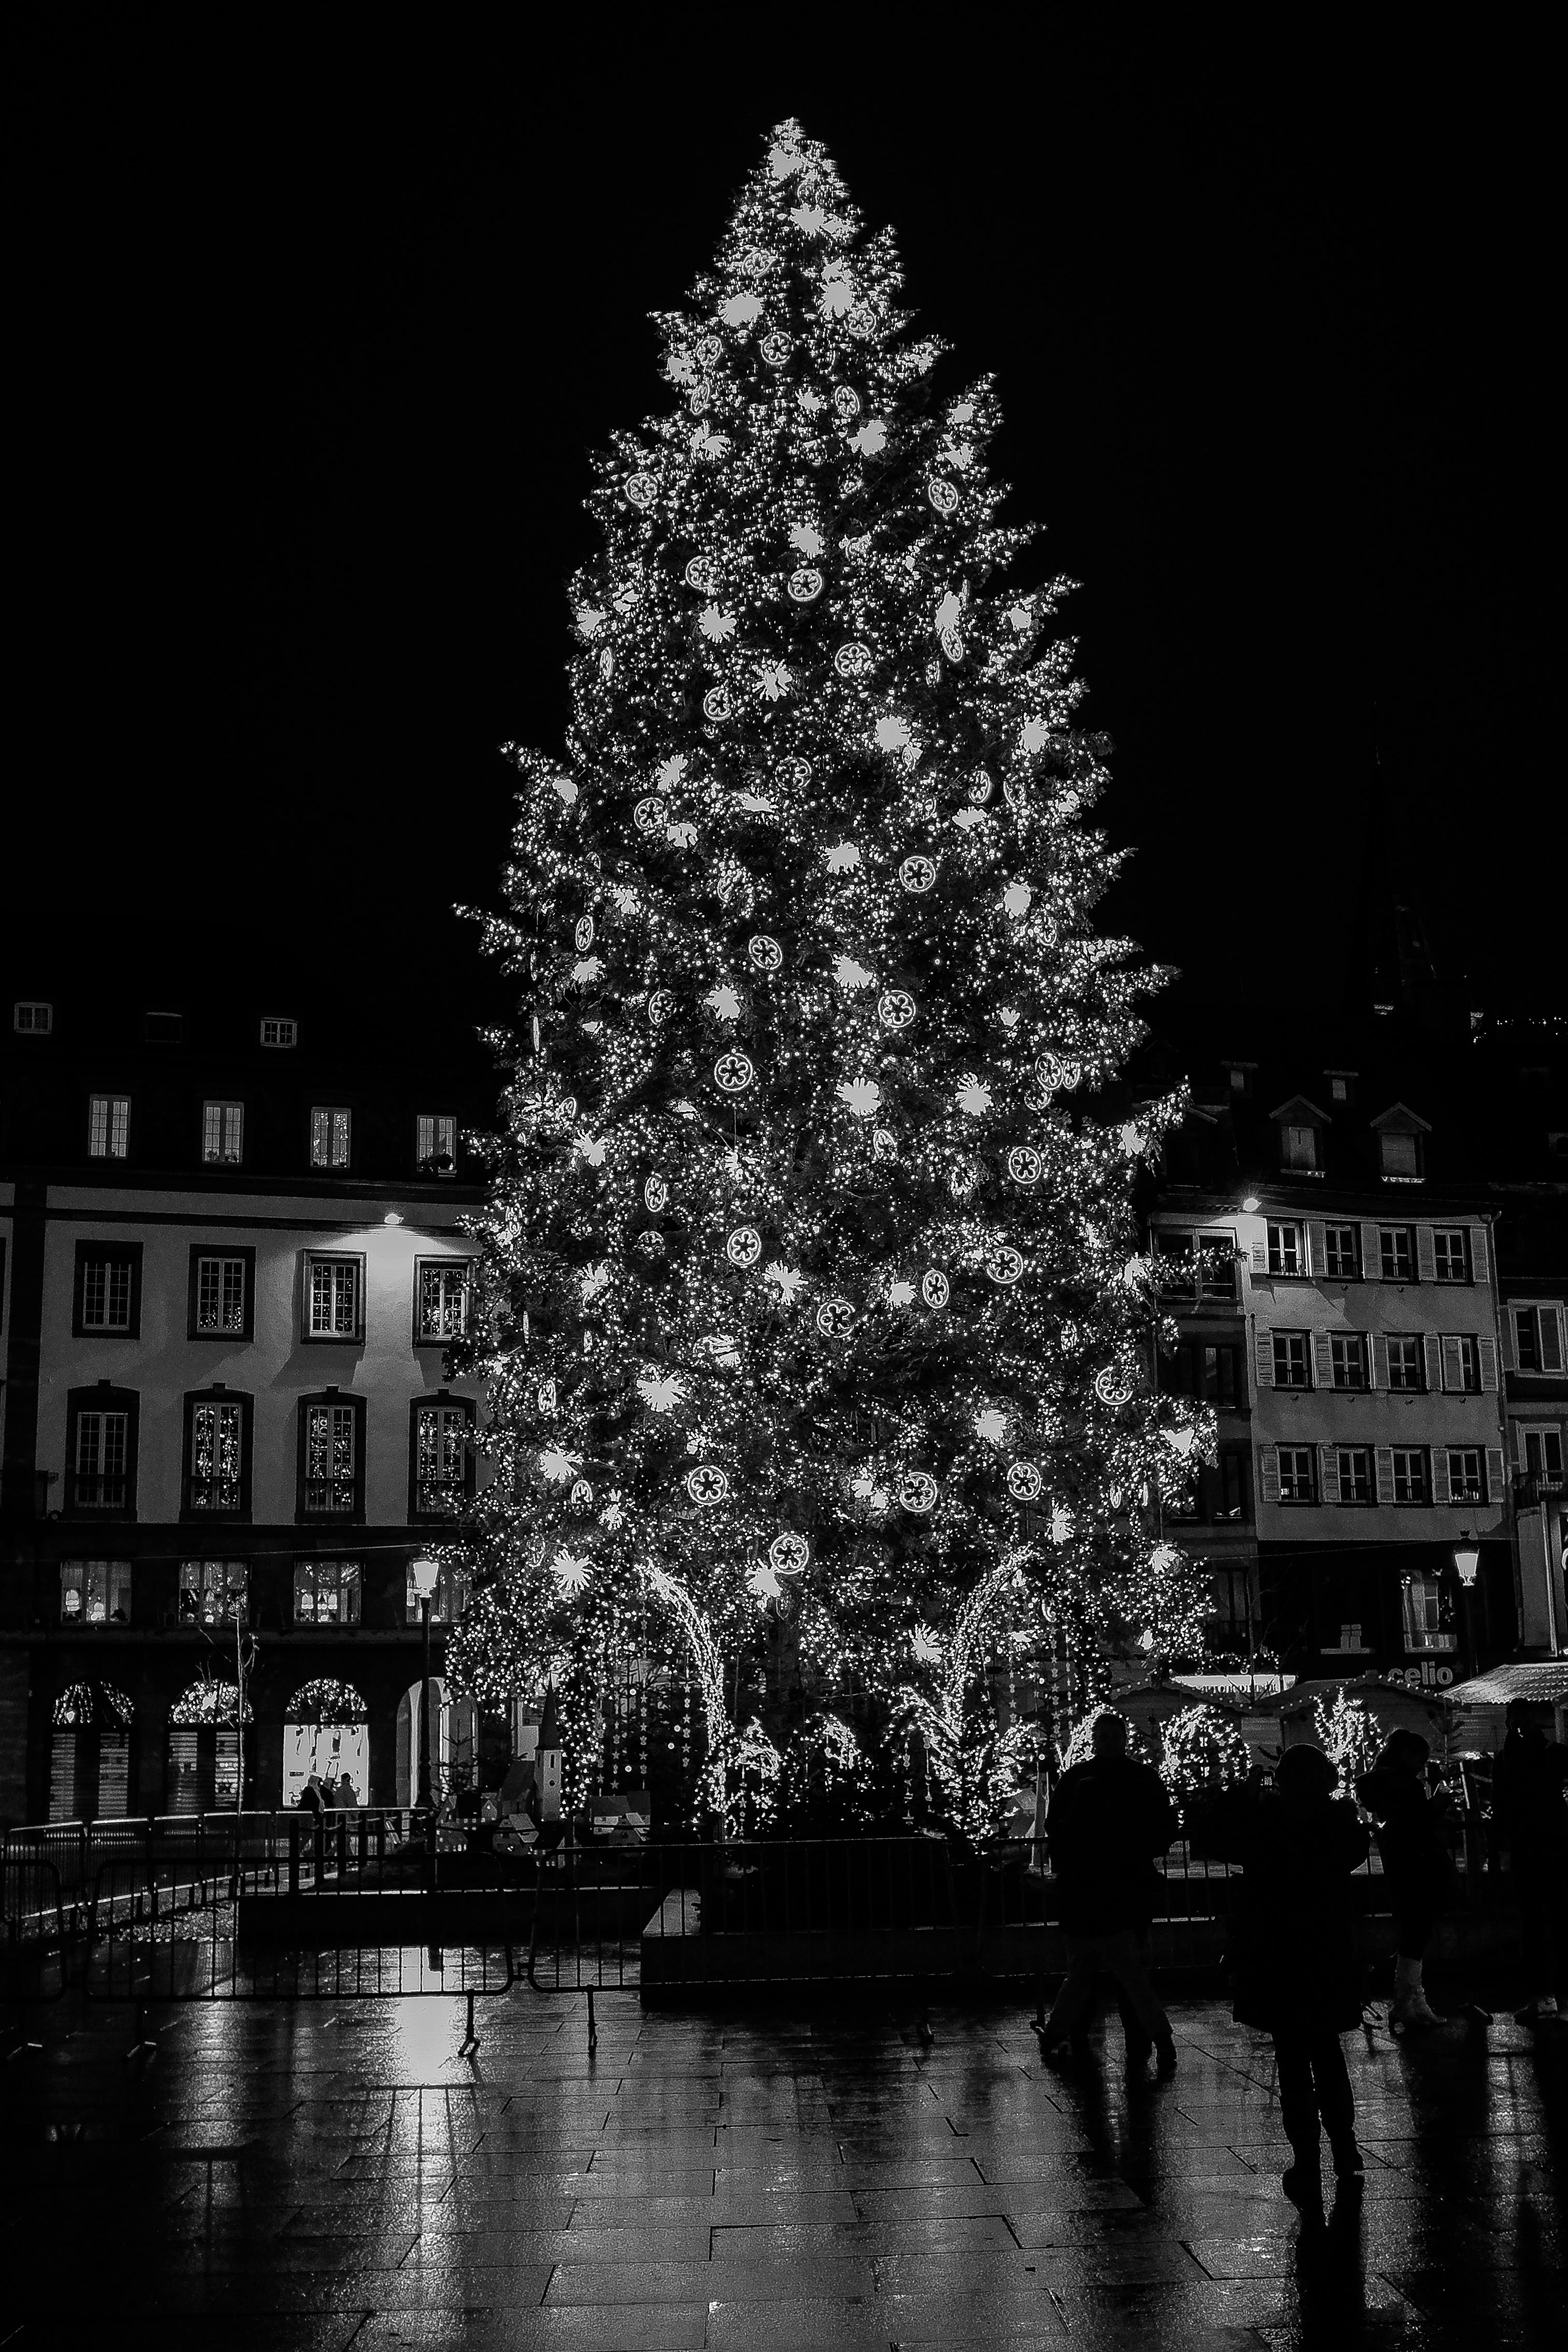 Gambar Hitam Dan Putih Jalan Malam Bunga Satu Warna Pohon Natal Dekorasi Natal Mono Simetri Strasbourg Schwarzweiss Weiss Schwarz Selamat Natal Frankreich Weihnachten Weihnachtsbaum Fest Monochrom Selamat Berlibur Streetshot